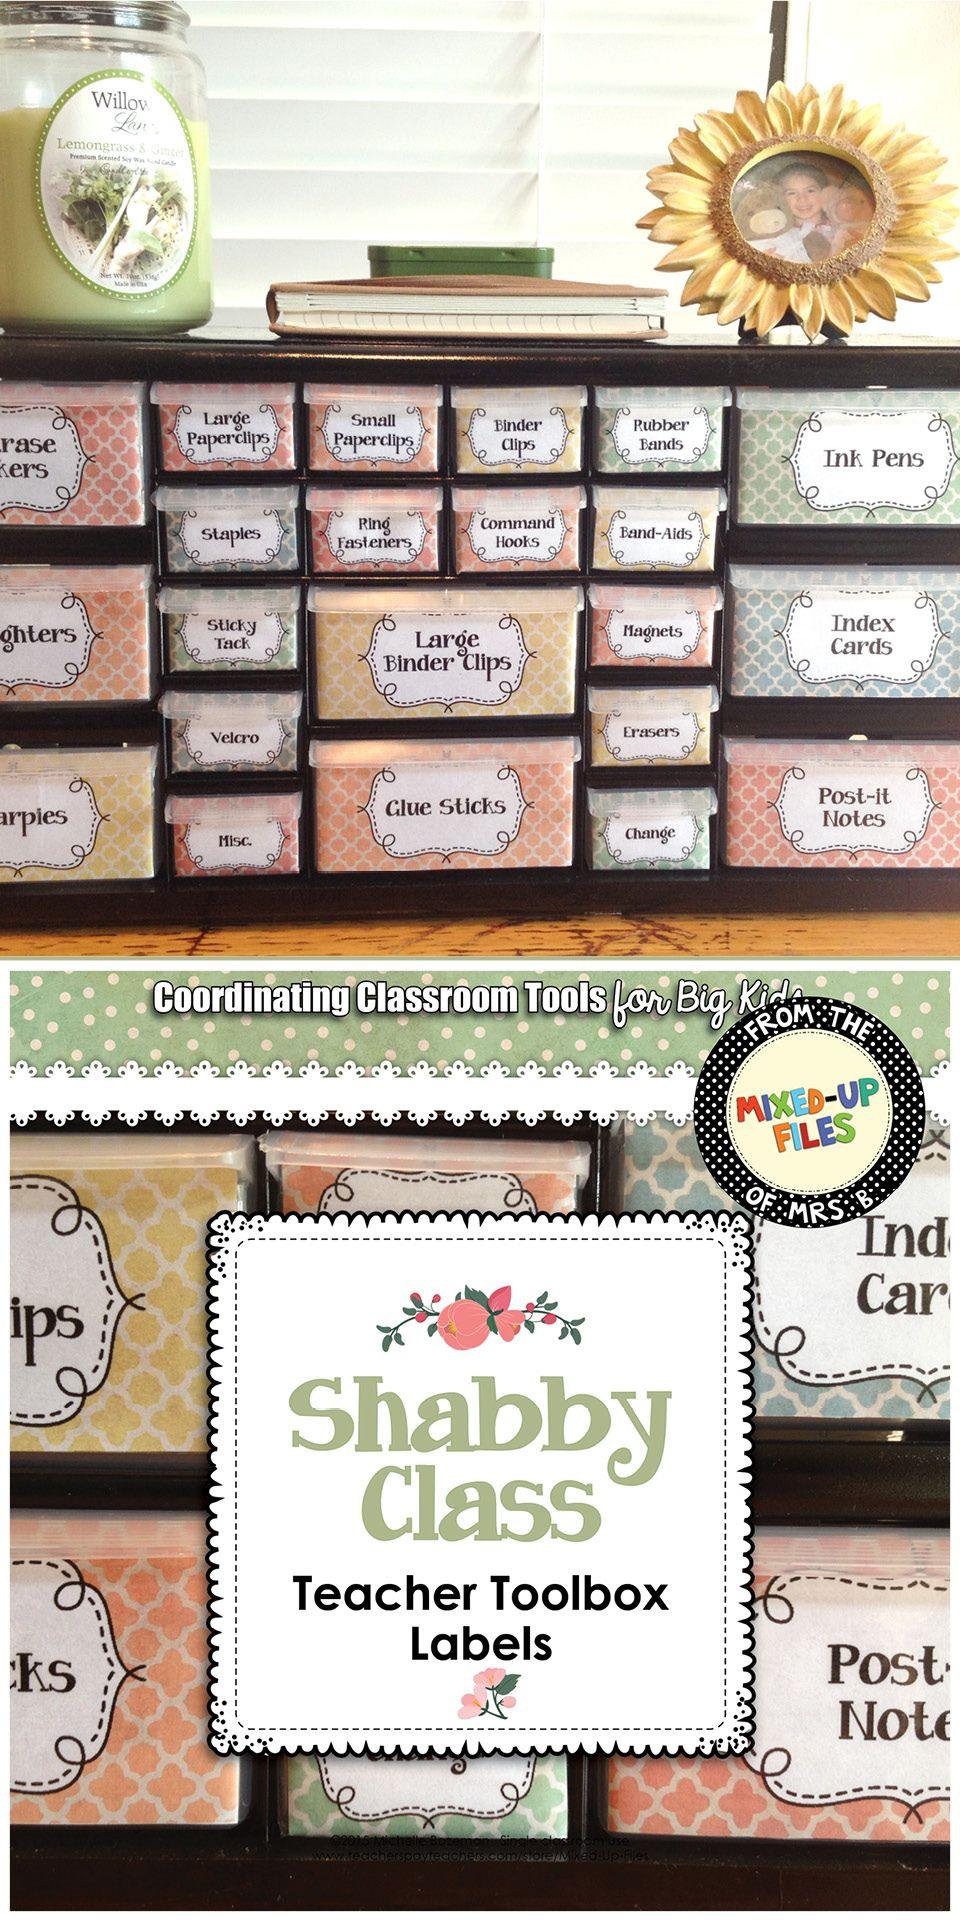 Shabby Chic Teacher Toolbox Labels Editable Teacher Toolbox Labels Teacher Toolbox Teachers Toolbox